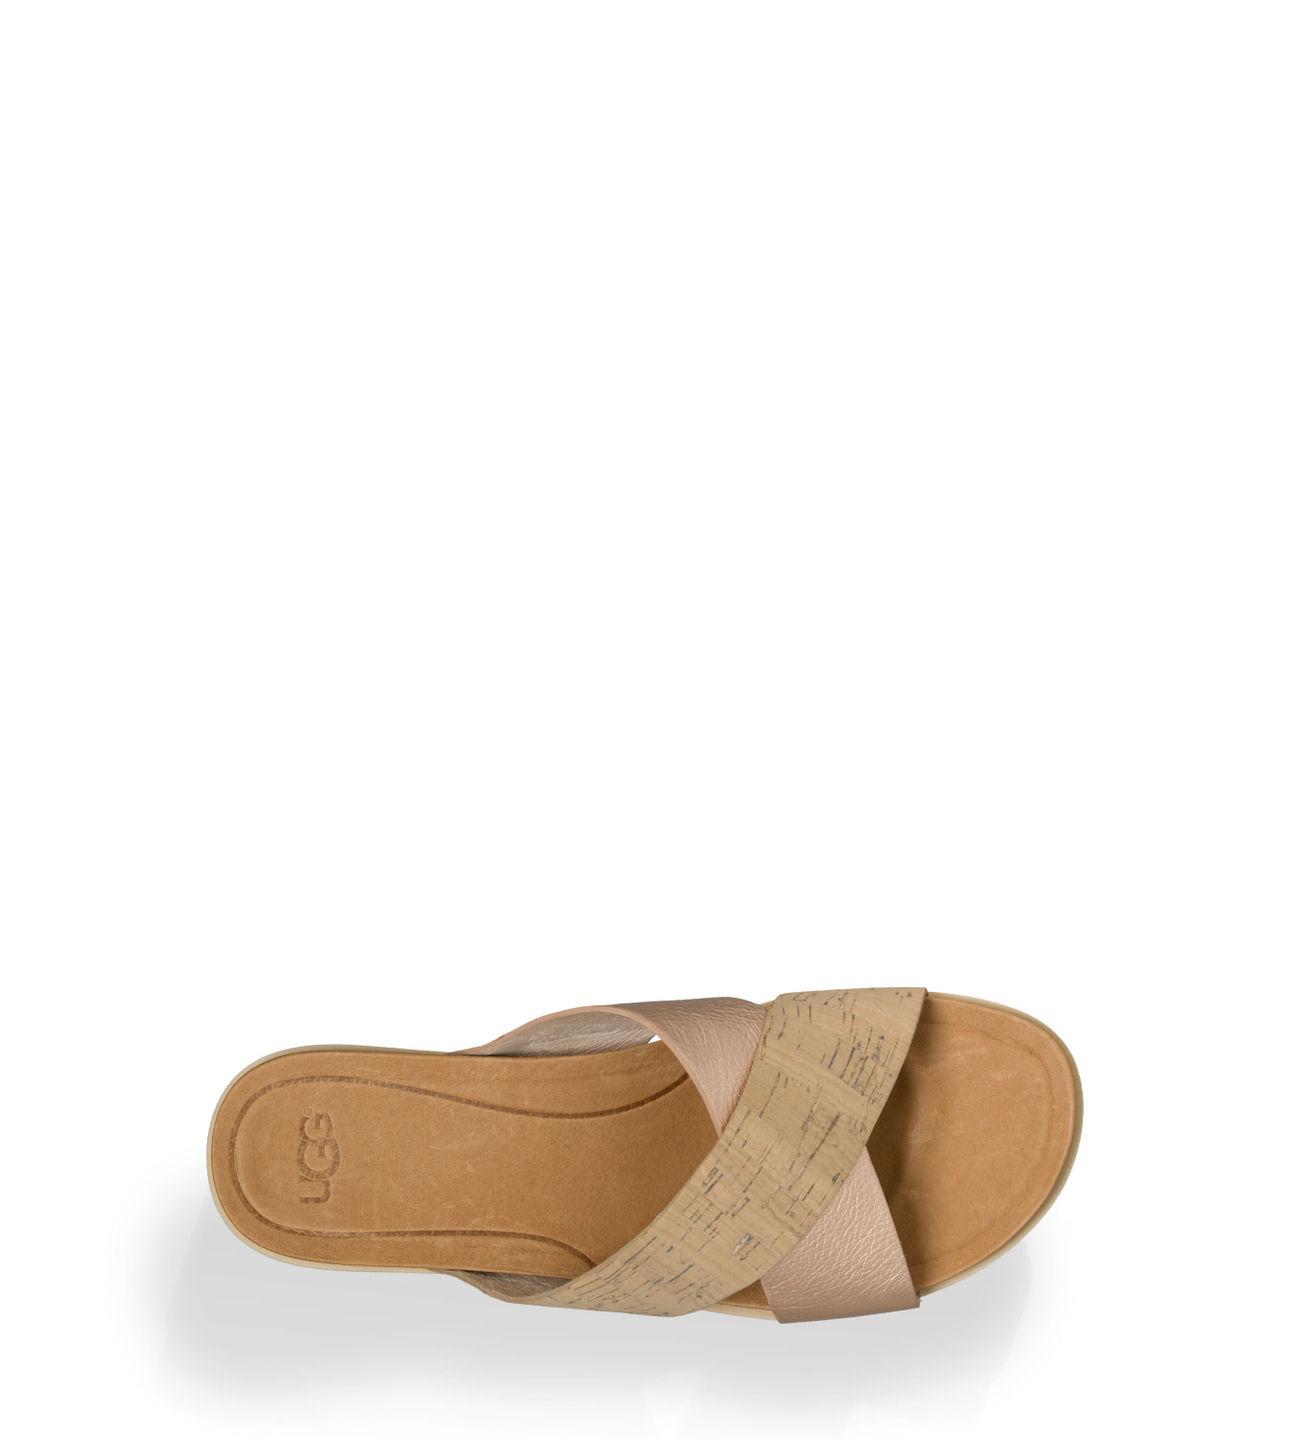 ugg kari sandals uk